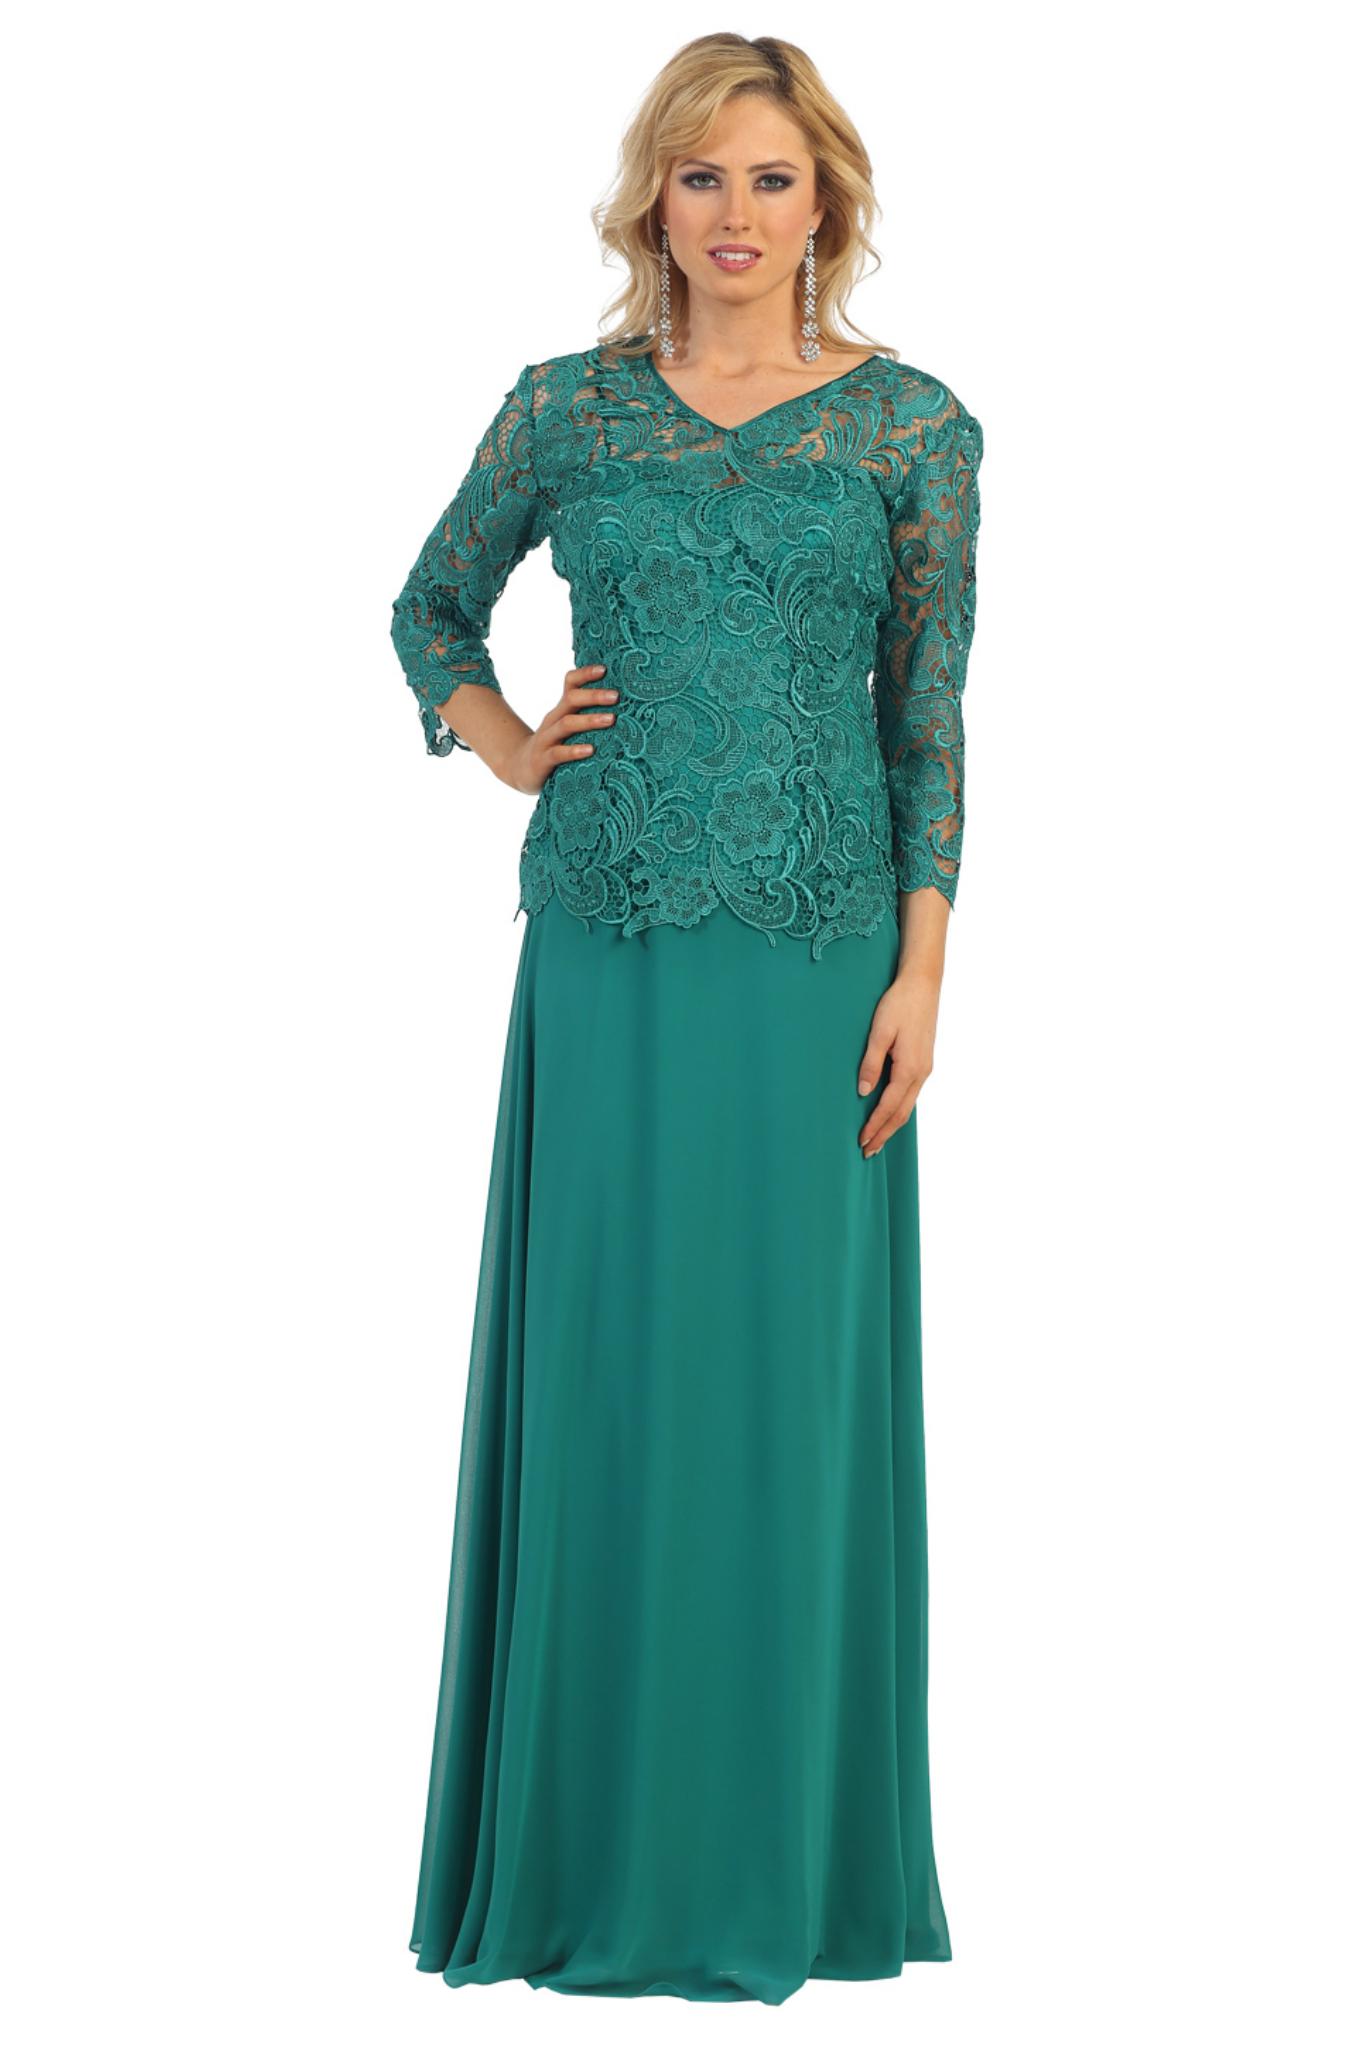 Fine Sears Bridal Gowns Frieze - Wedding Dress - googeb.com